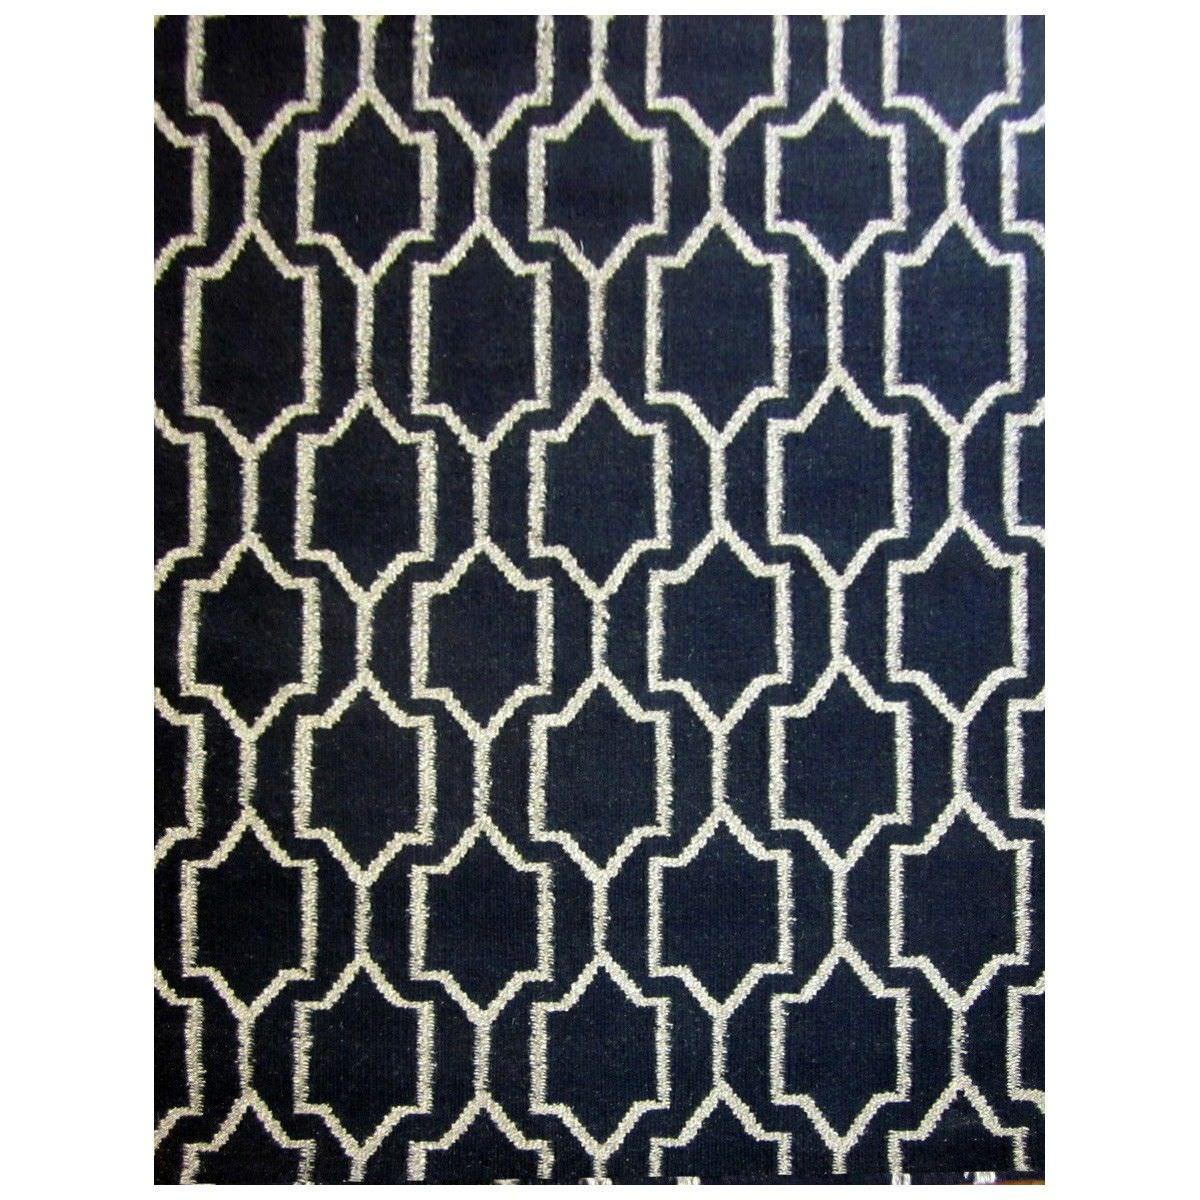 Mundoo Handwoven Wool Dhurrie Rug, 160x110cm, Black